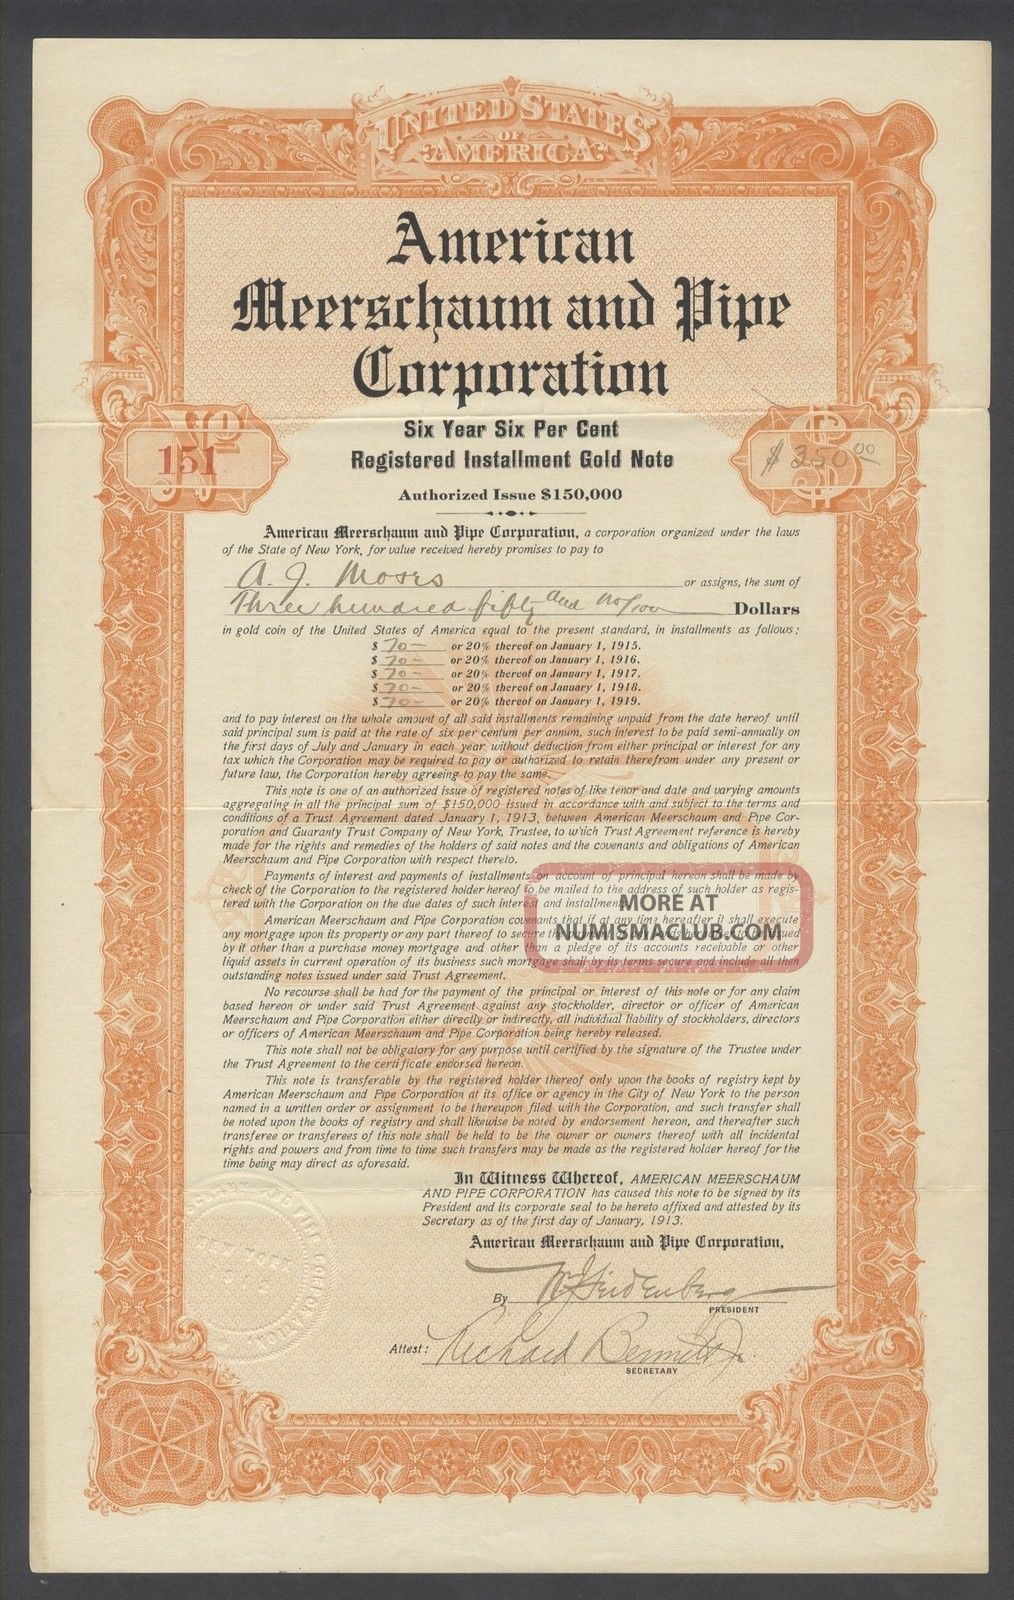 United States 1913 Ornate Bond Certificate American Meerschaum & Pipe Co.  R4072 World photo